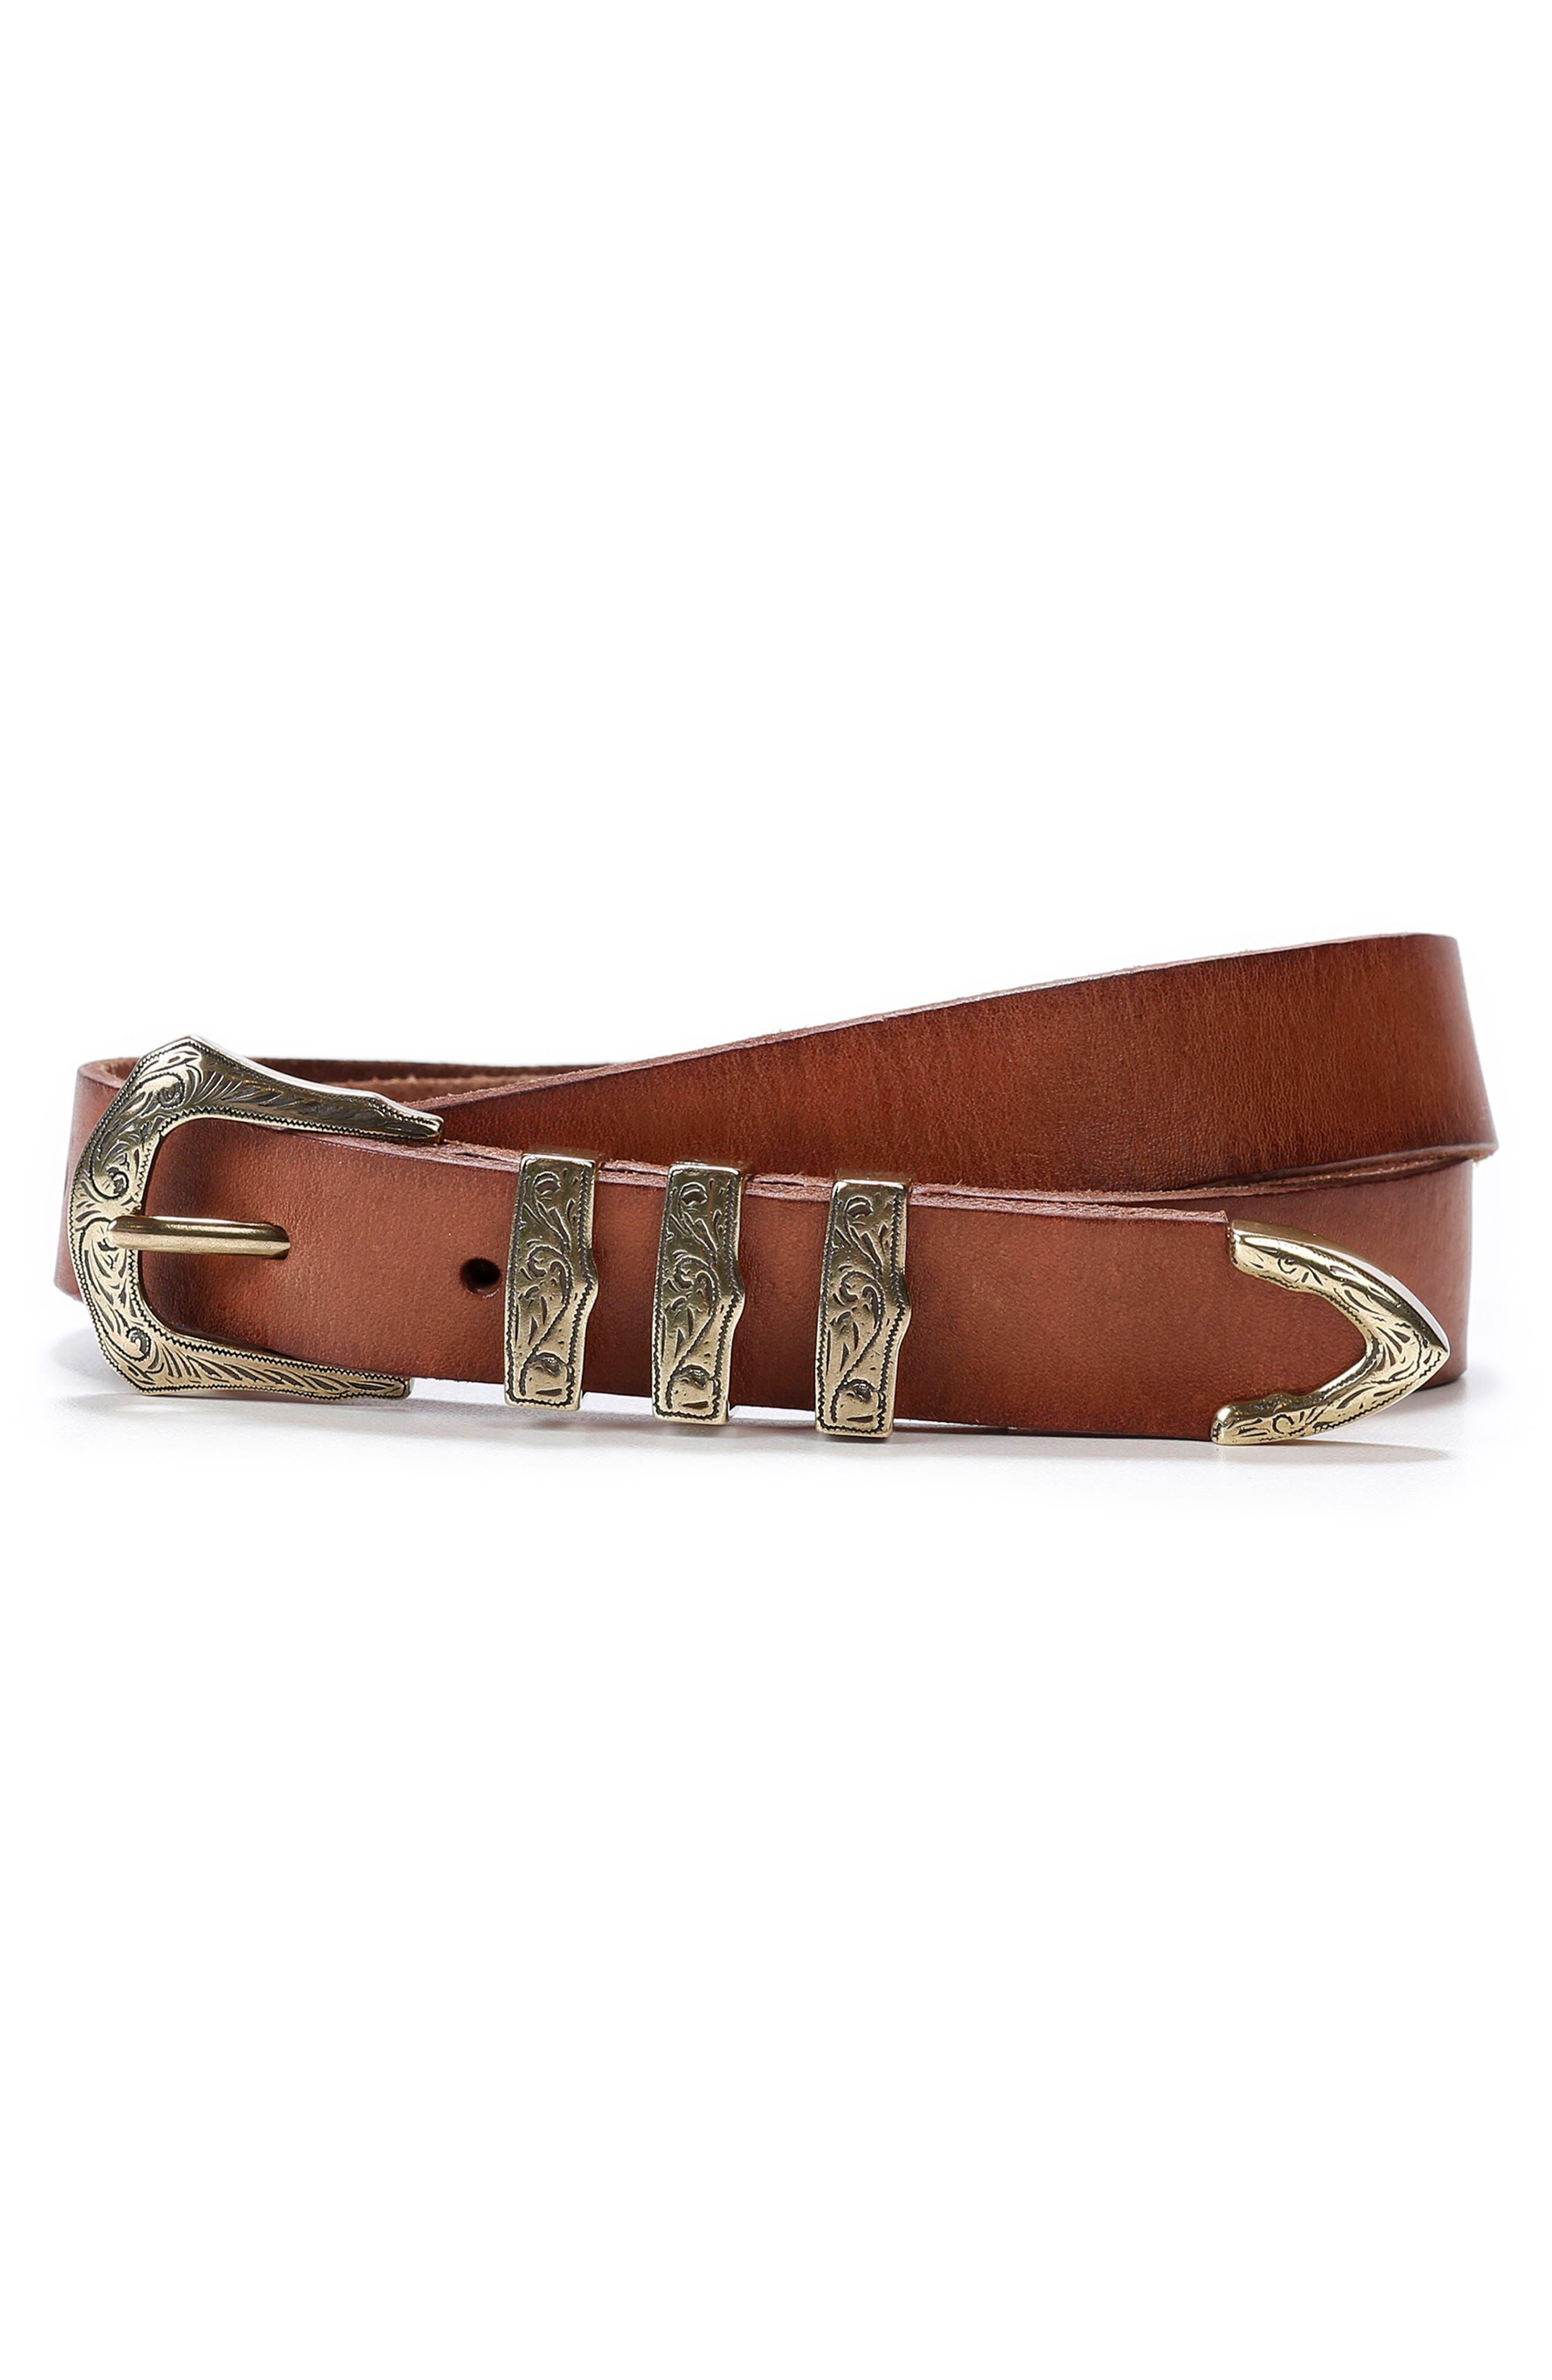 Main Image - PAIGE Abigail Leather Belt